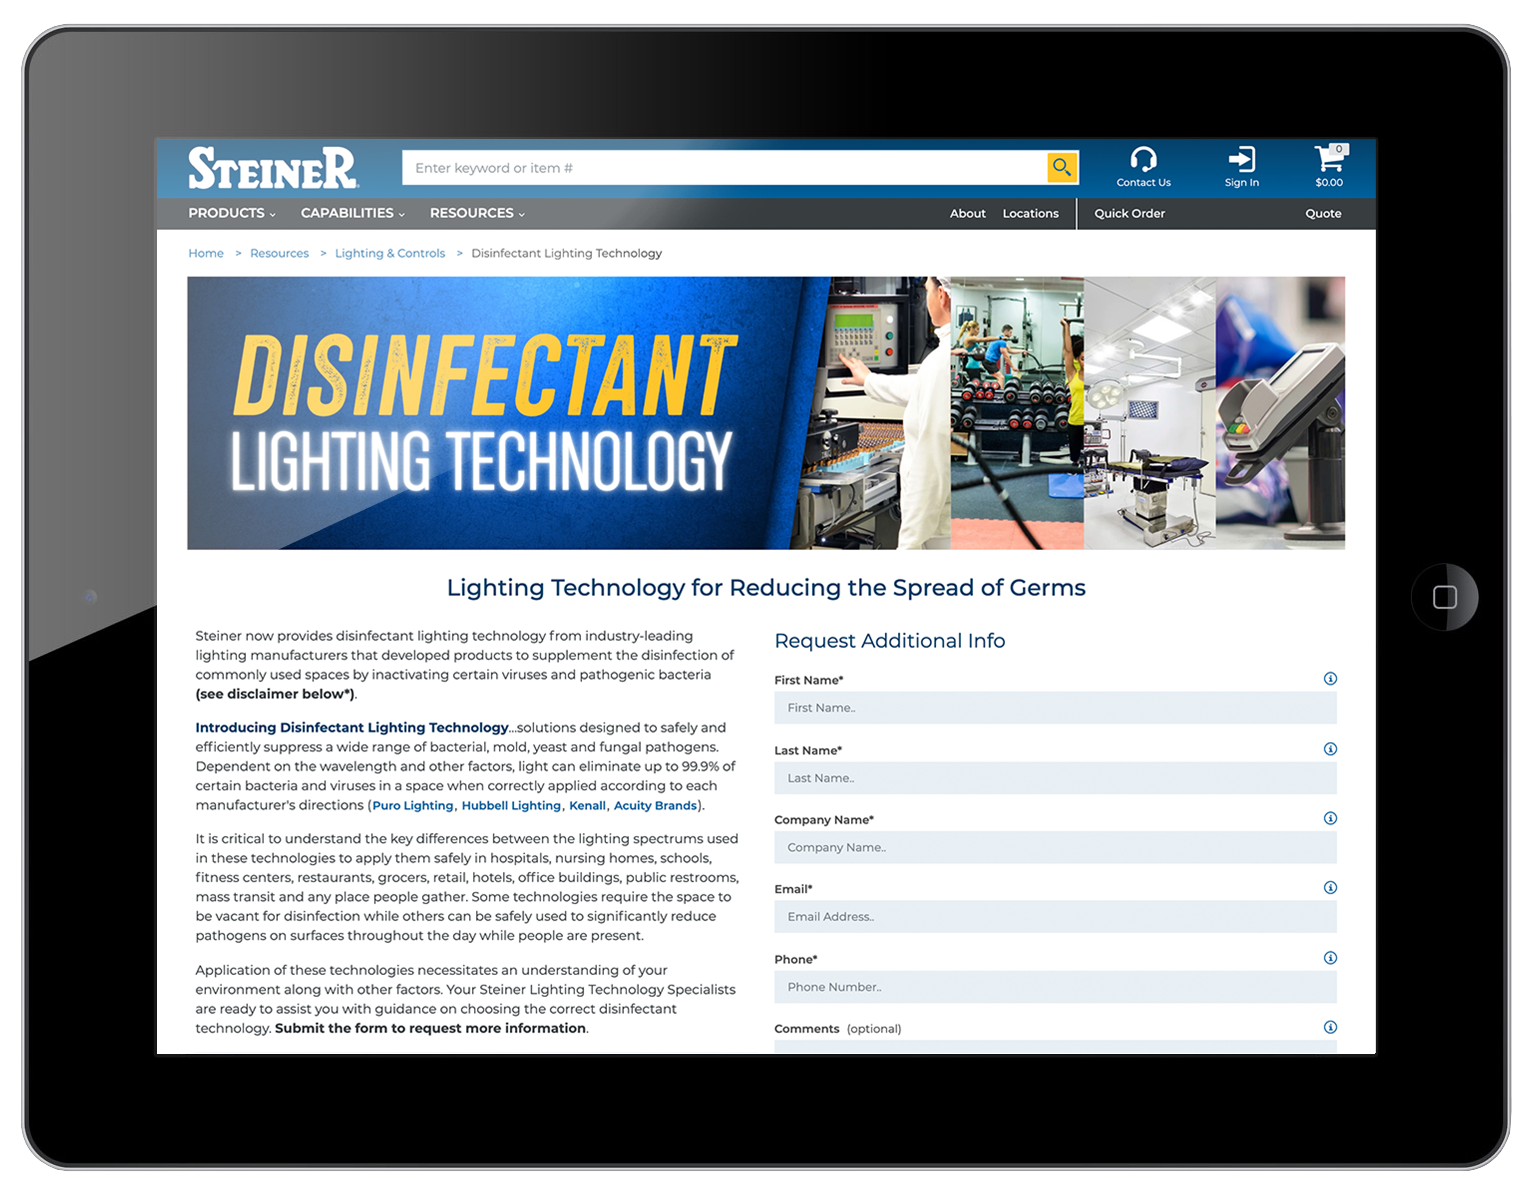 Disinfectant Lighting Technology